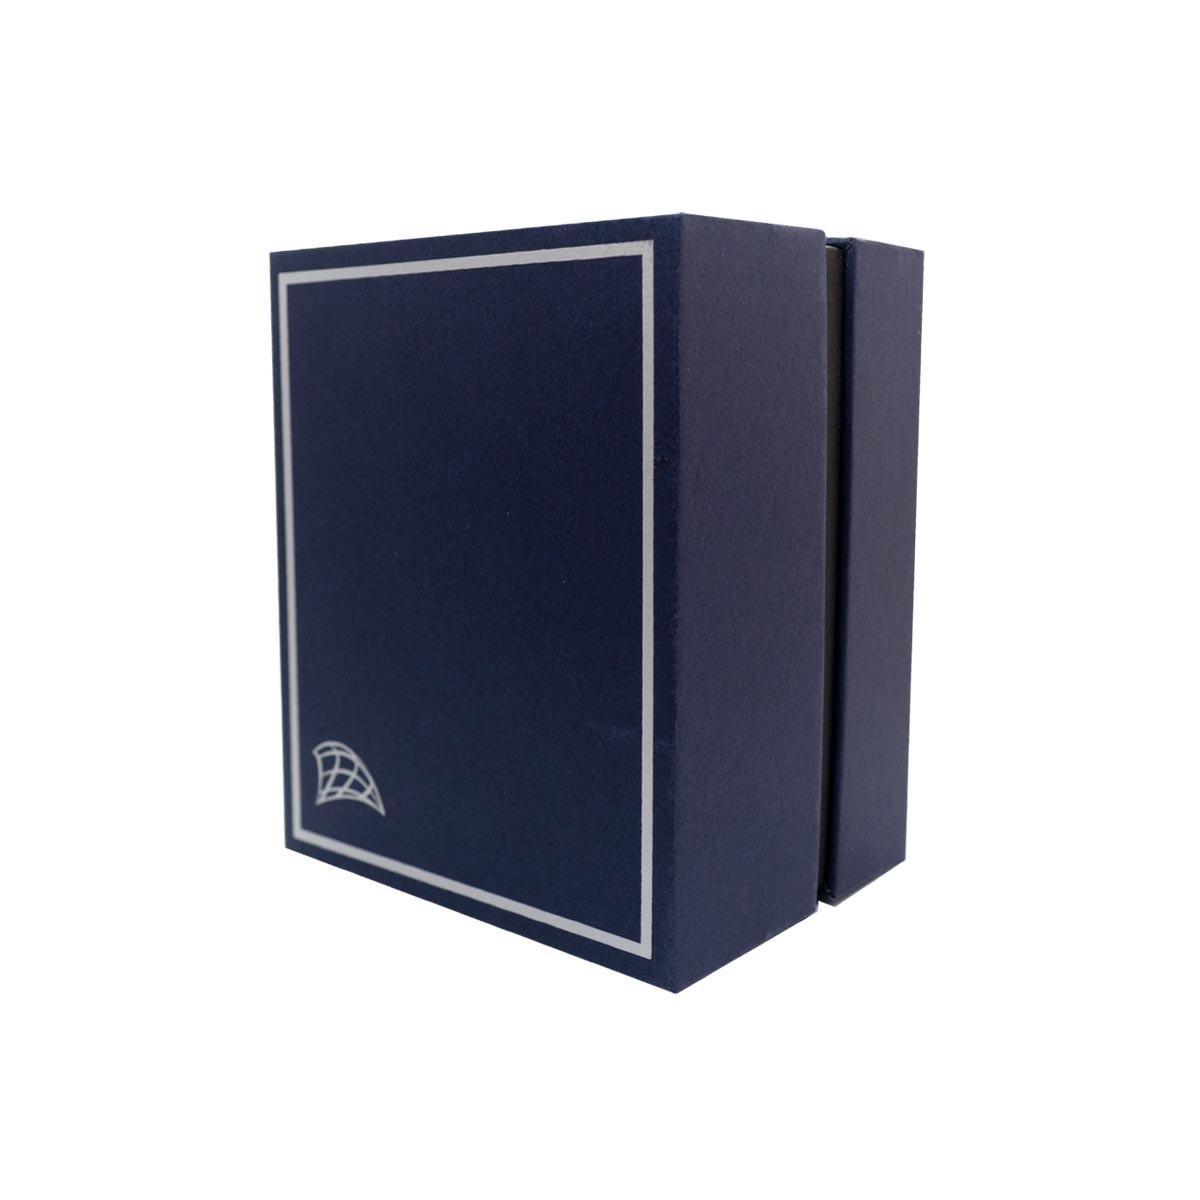 Montre Spinnaker HULL Automatique  - Cadran Vert - SP-5059-03